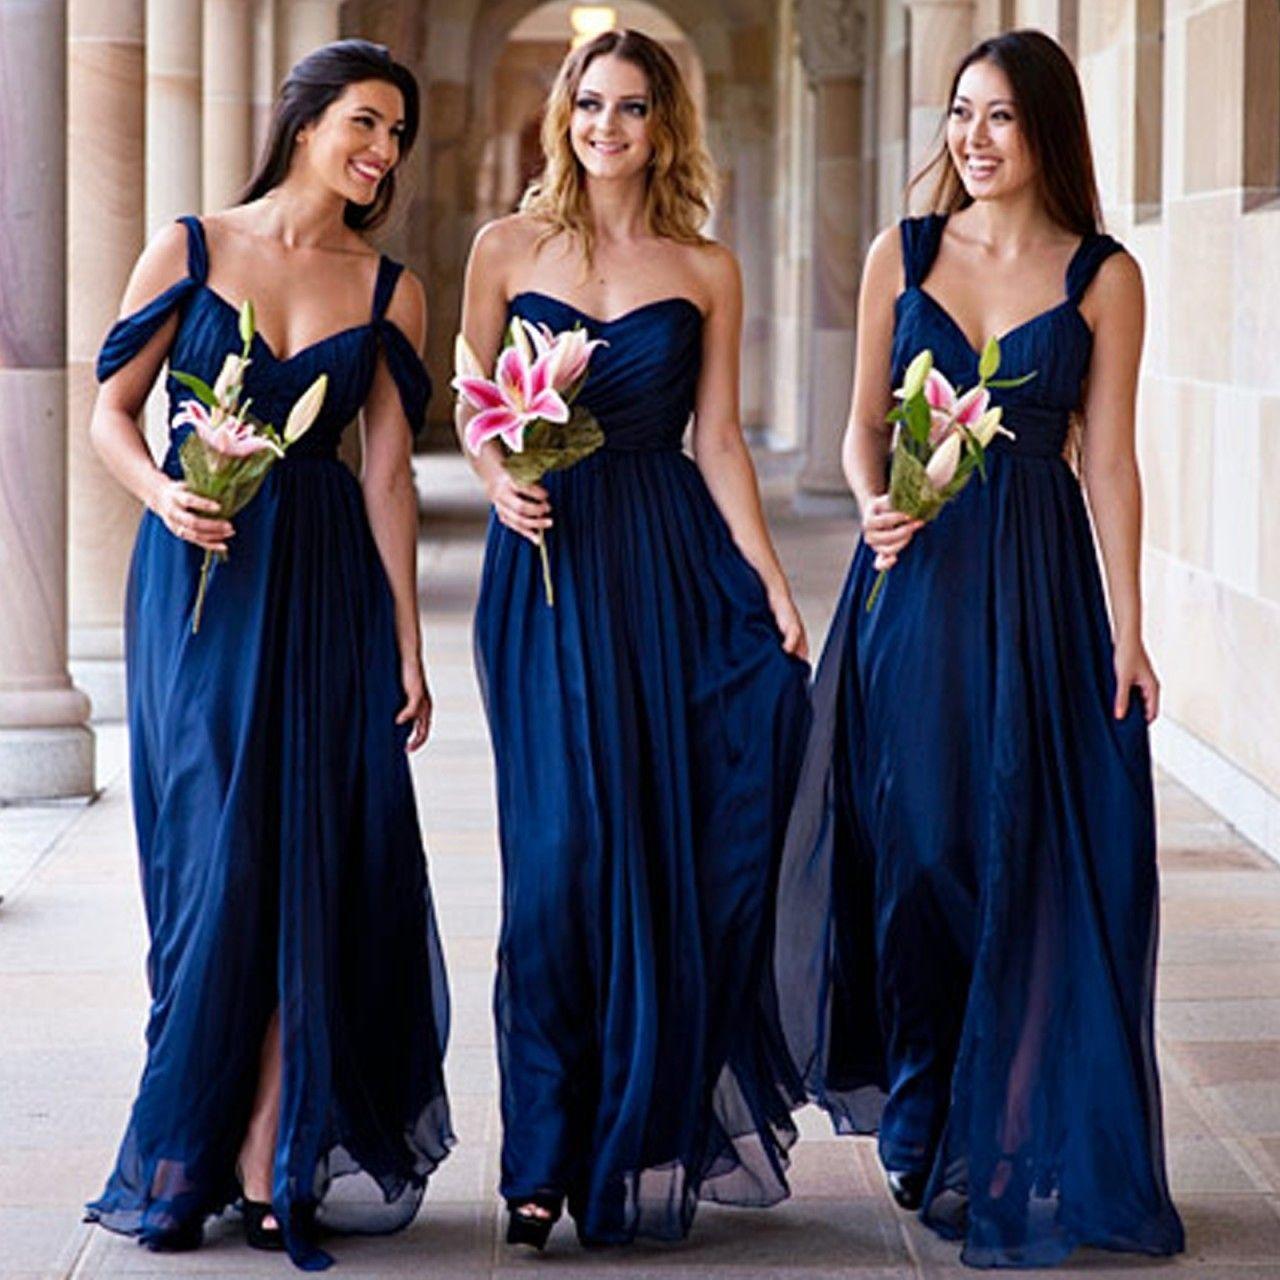 Tania olsen dress bridesmaid dresses online sydney melbourne bridesmaid ombrellifo Gallery